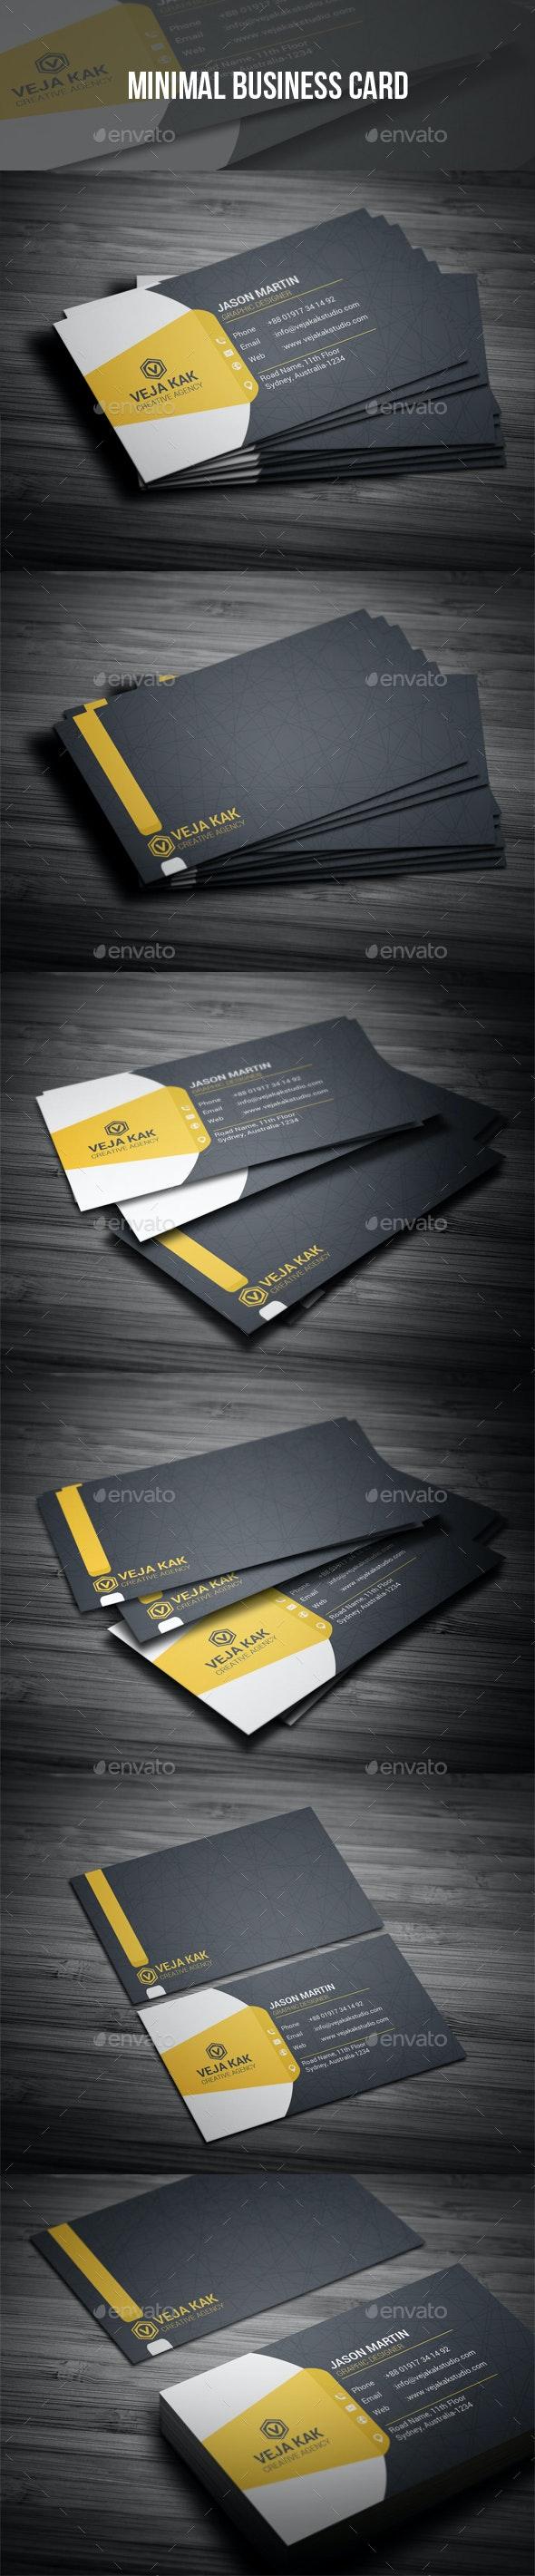 Minimal Business Card - Creative Business Cards